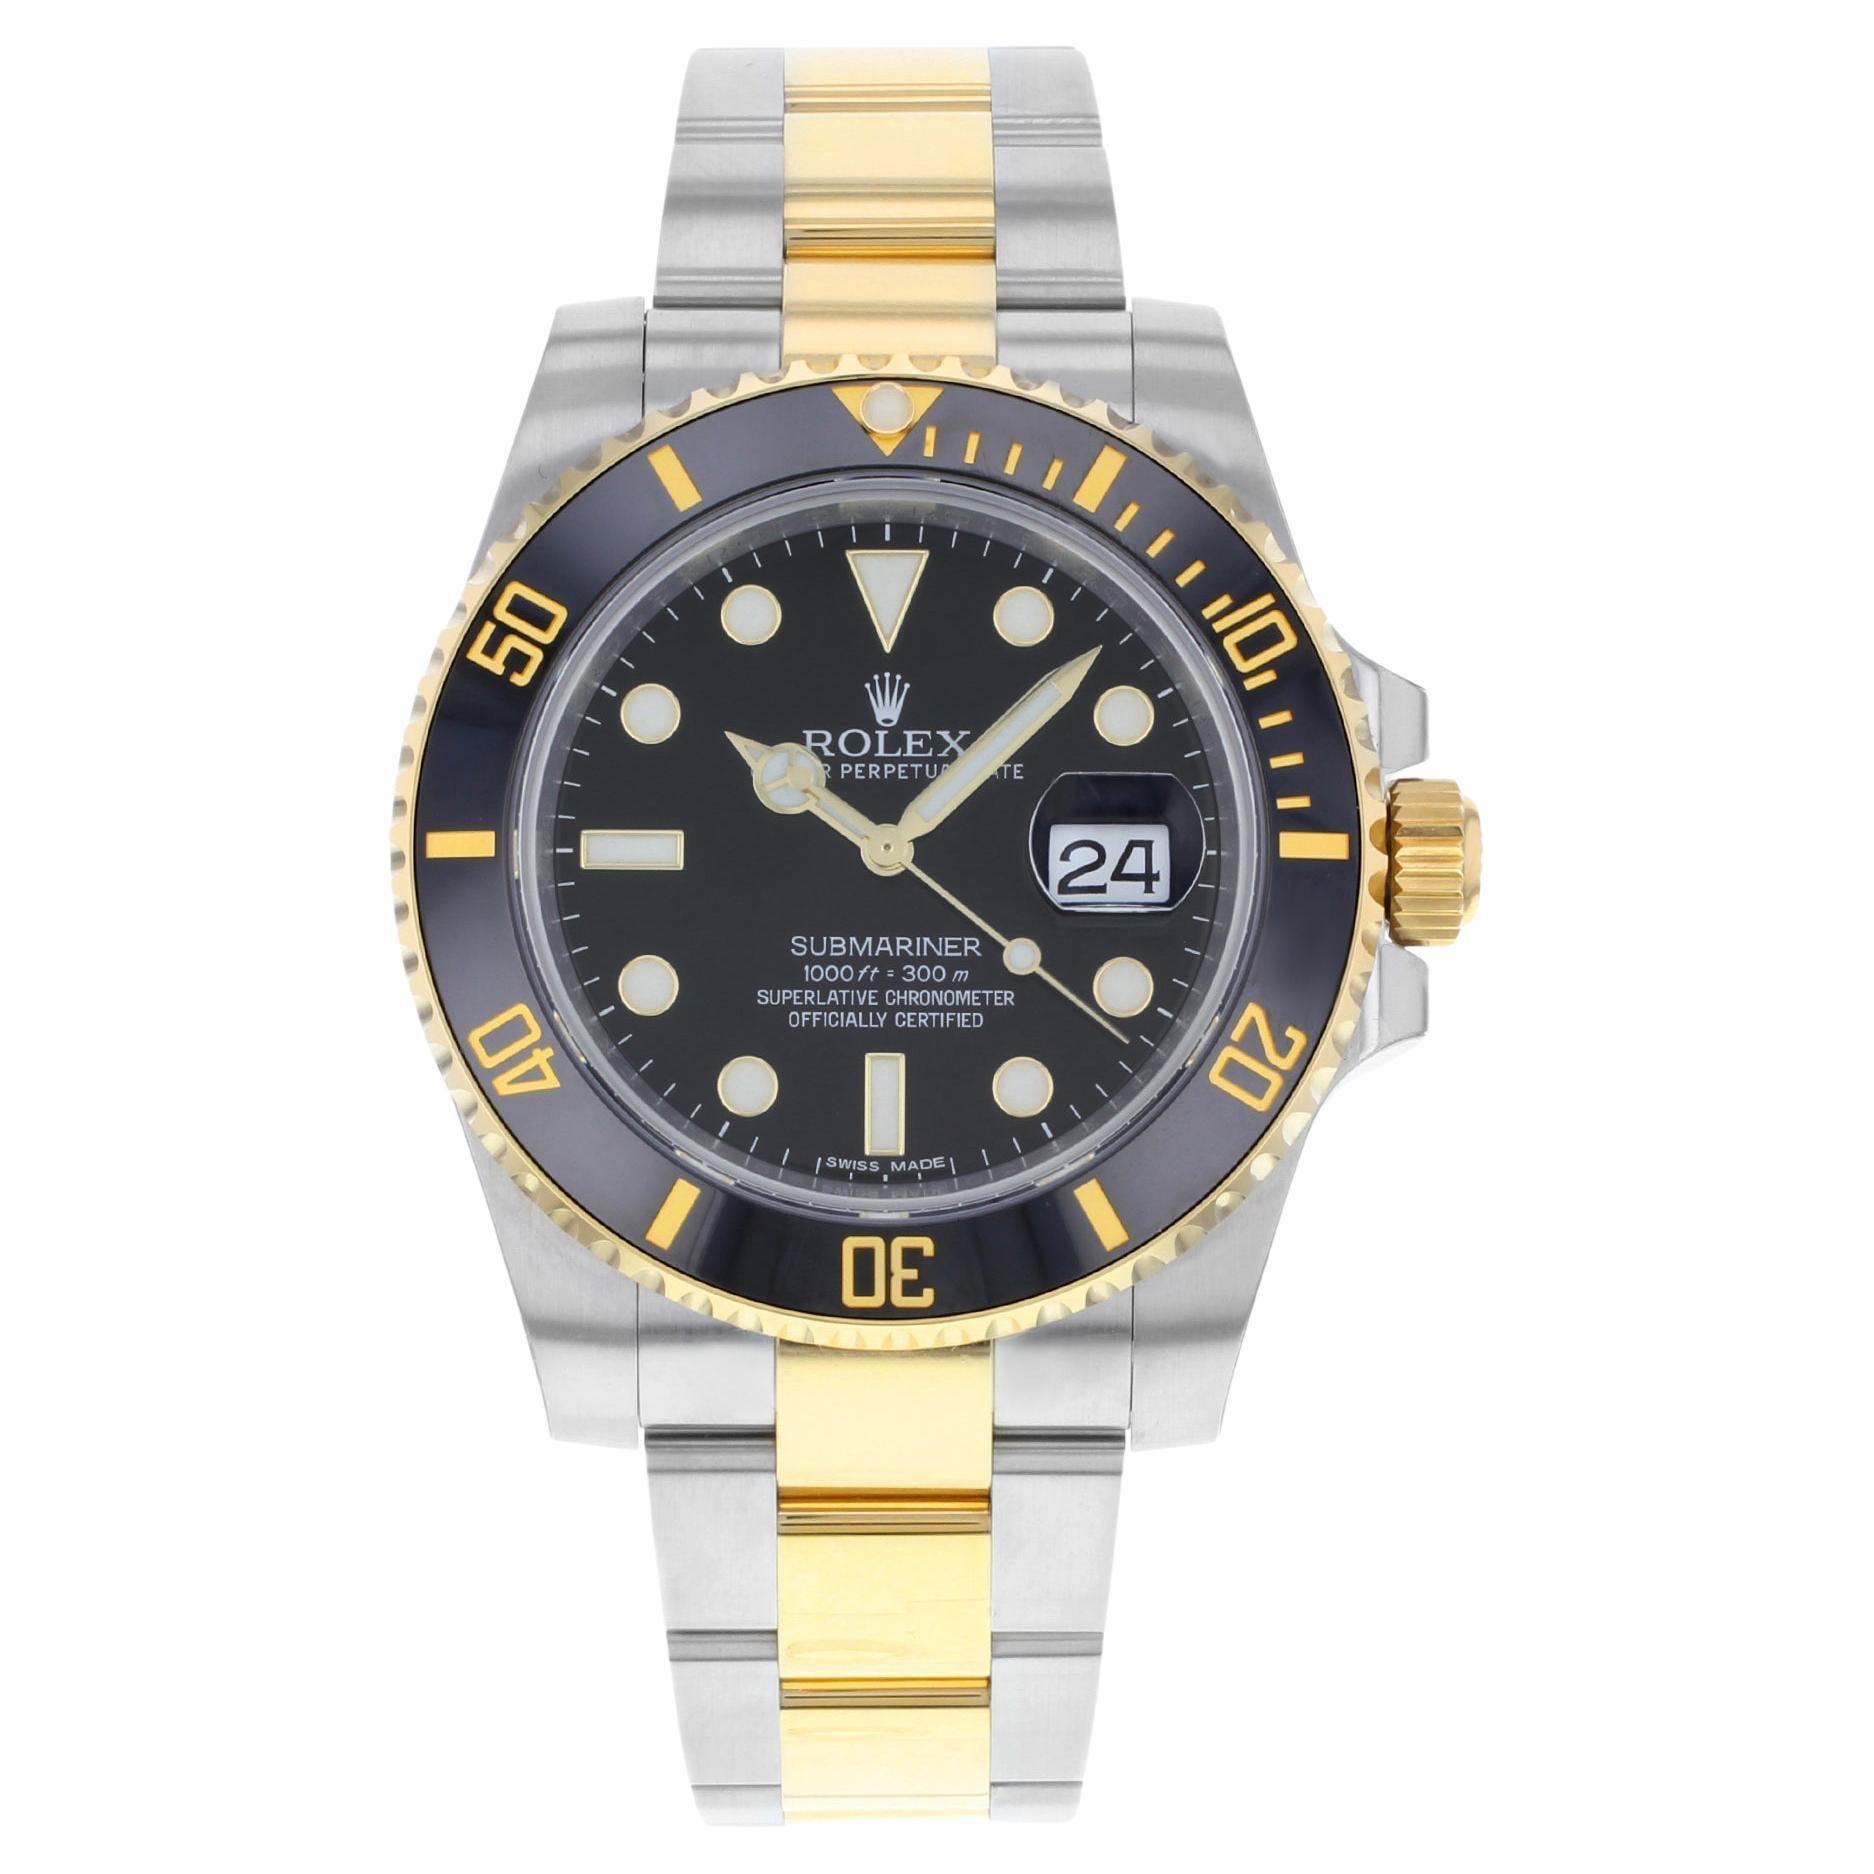 Rolex Submariner Steel 18k Yellow Gold Black Dial Mens Watch 116613LN